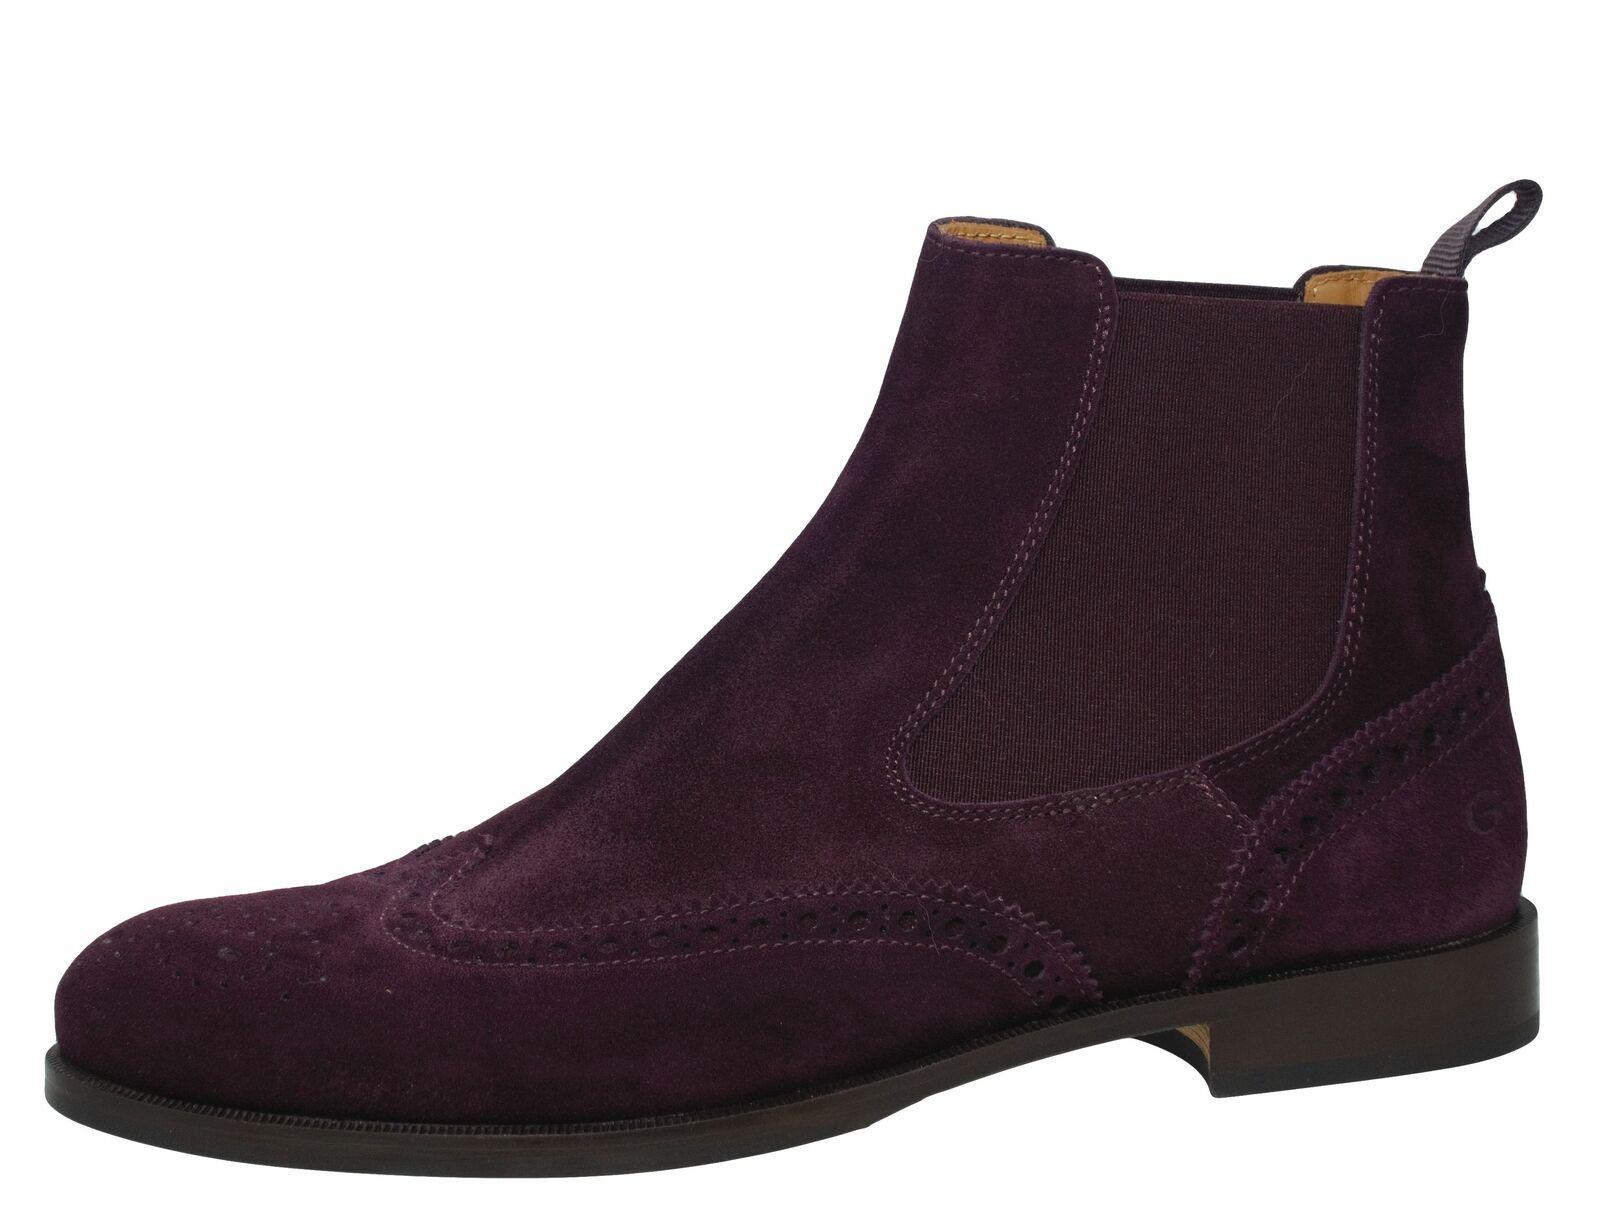 Gallucci 5078 Stiefeletten Chelsea Stiefel Leder Budapester rot Gr. 39 - 41 Neu